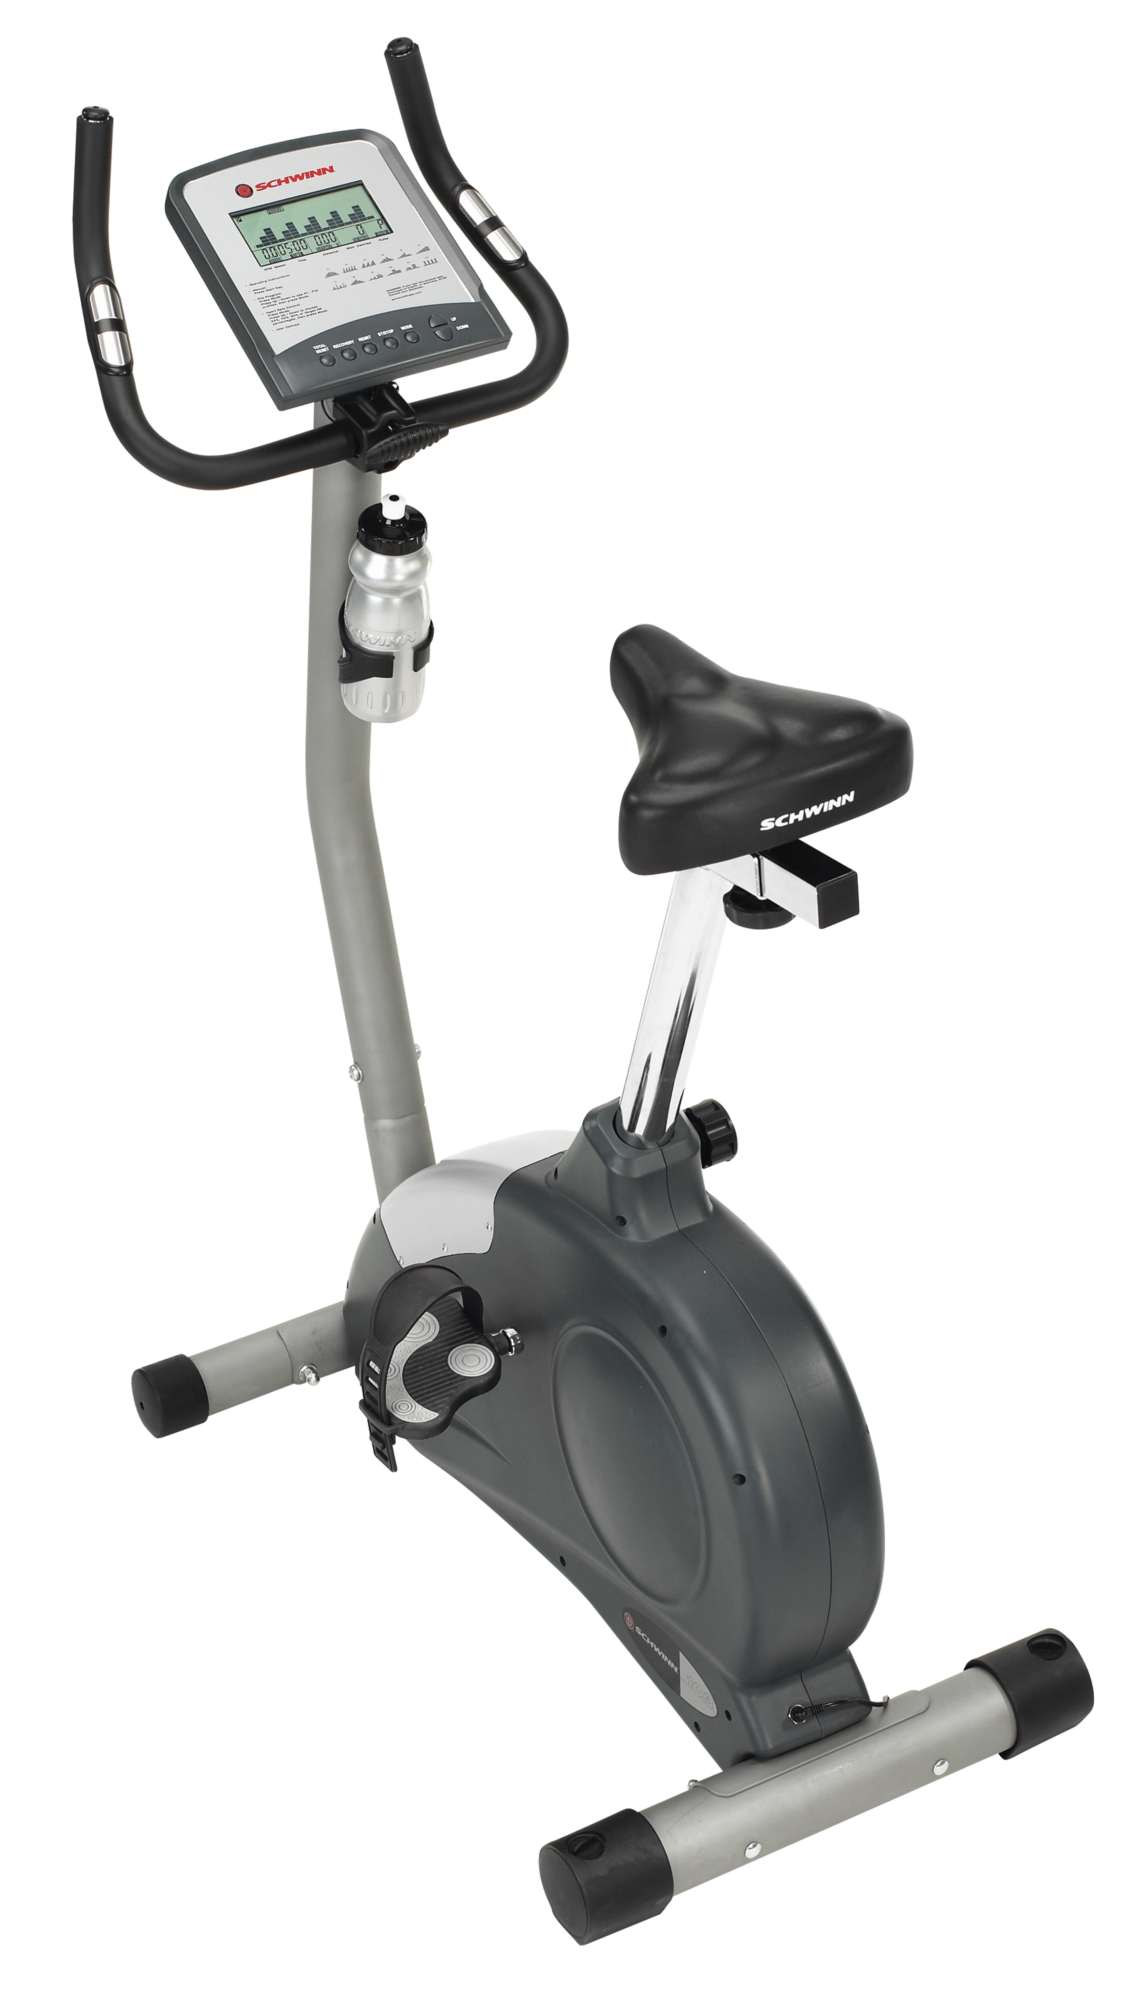 Schwinn Bicycle Parts Breakdown : Schwinn airdyne parts diagram treadmill